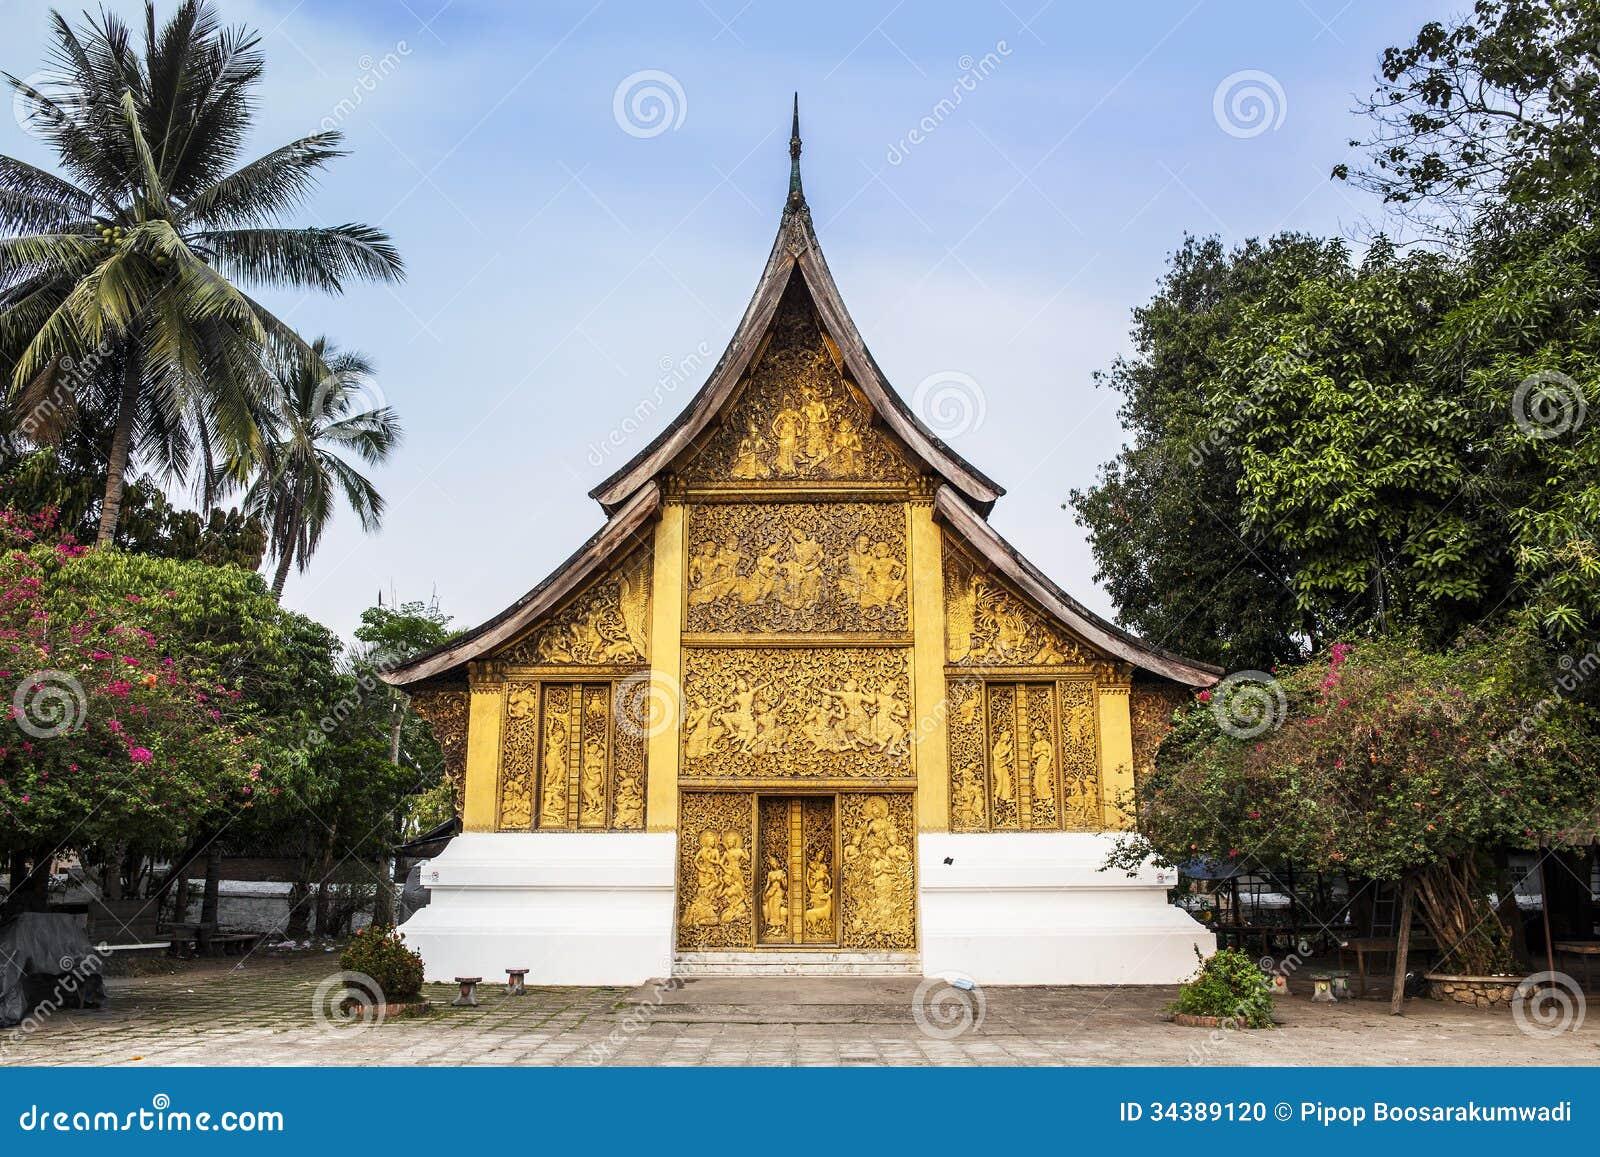 Wat Xieng Thong | Pure Laos Travel, Biking and Cultural Tours |Wat Xieng Thong Luang Prabang